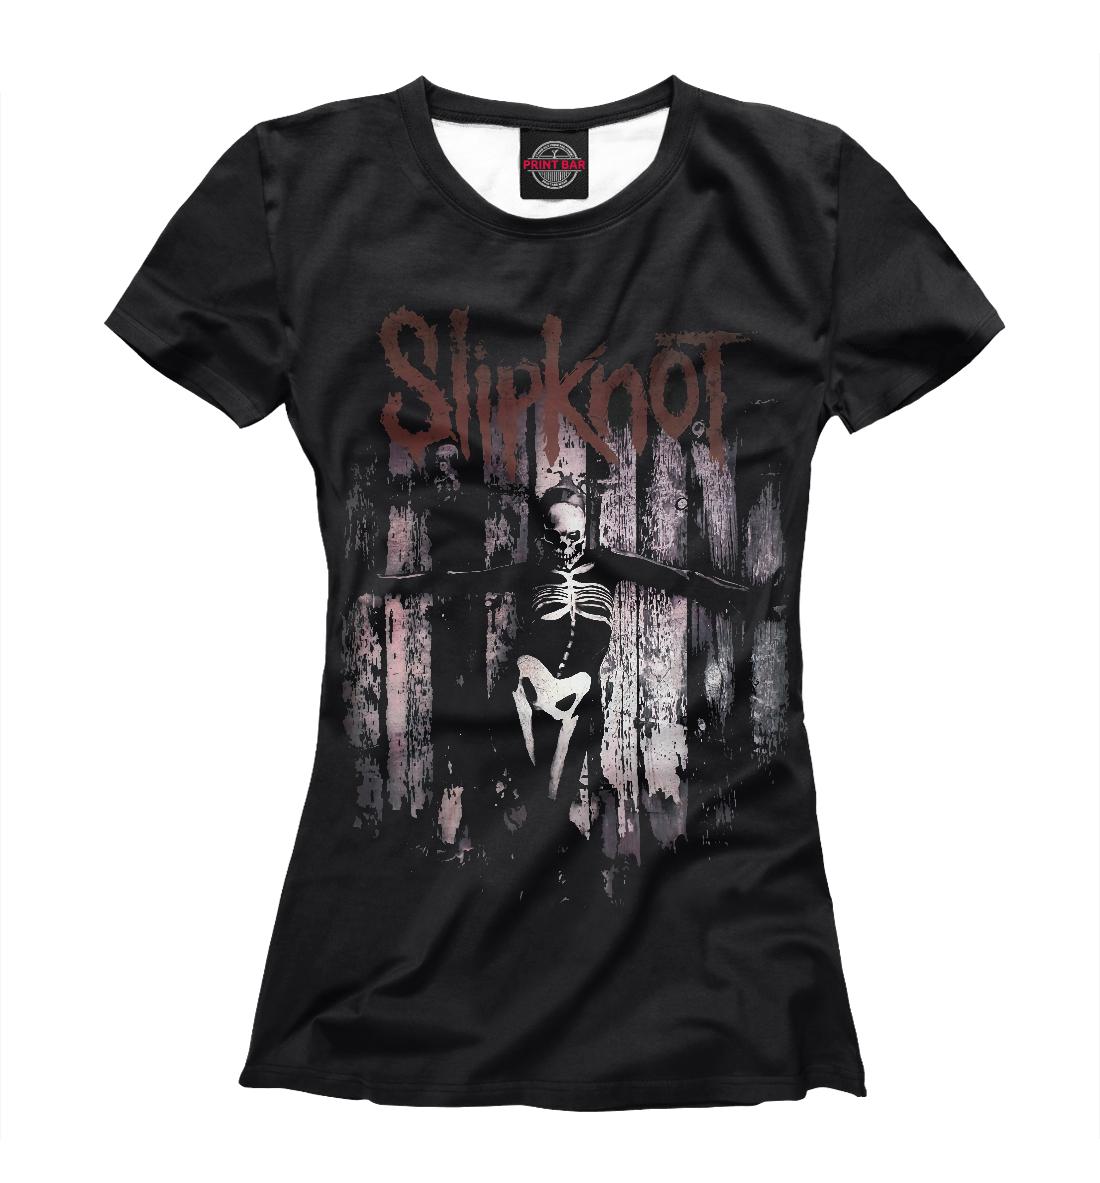 Купить Slipknot, Printbar, Футболки, SLI-141689-fut-1